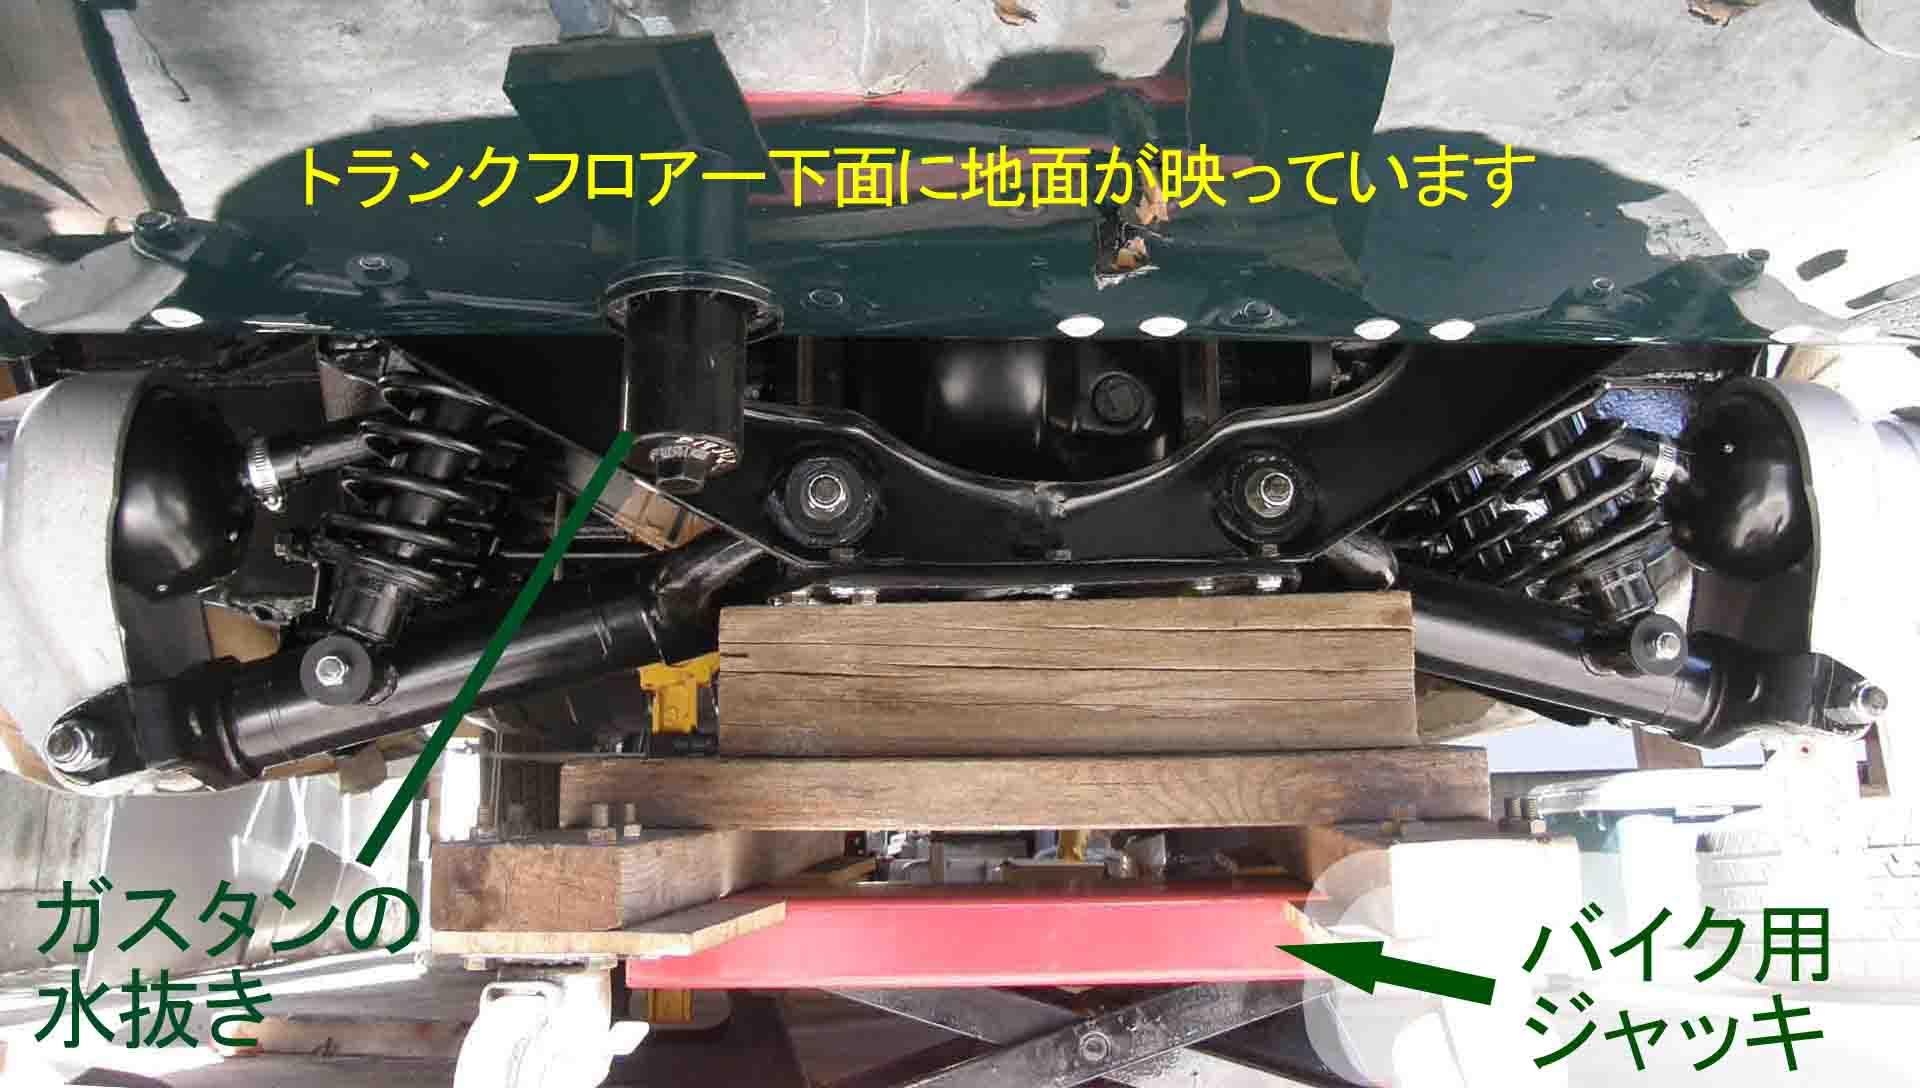 blogPB100593.jpg